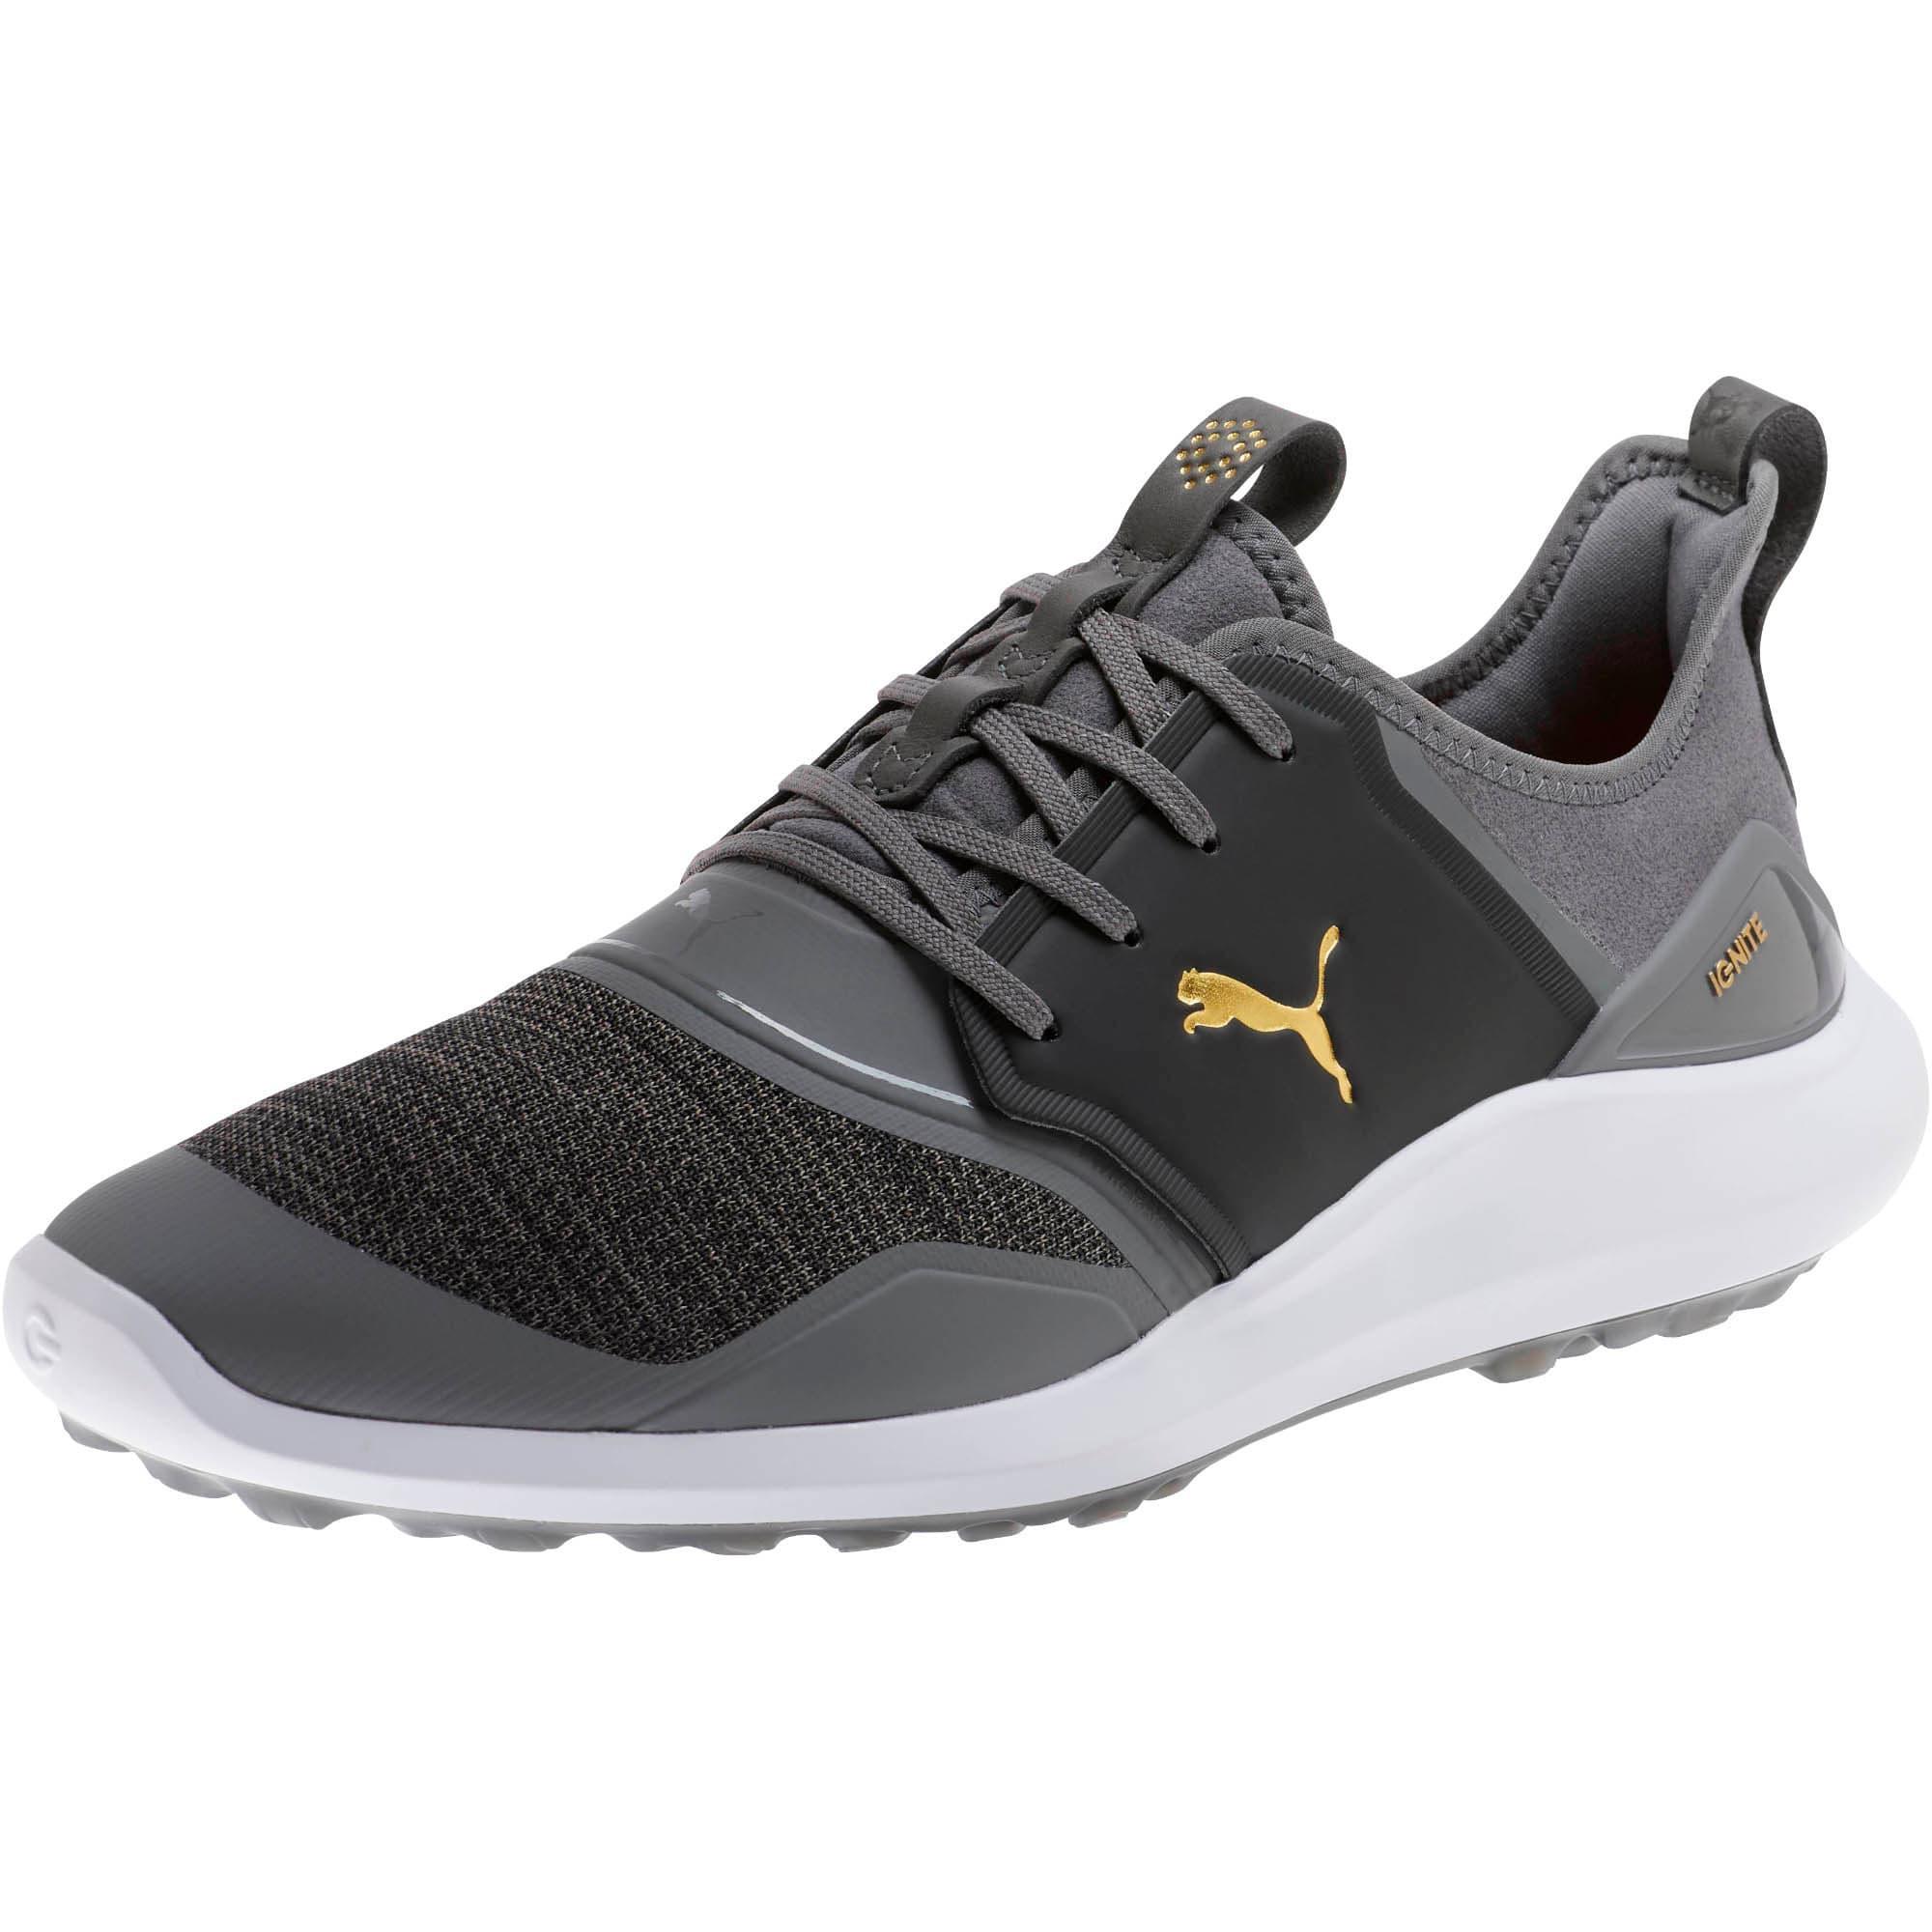 Thumbnail 1 of IGNITE NXT Men's Golf Shoes, QUIET SHADE-Gold-Black, medium